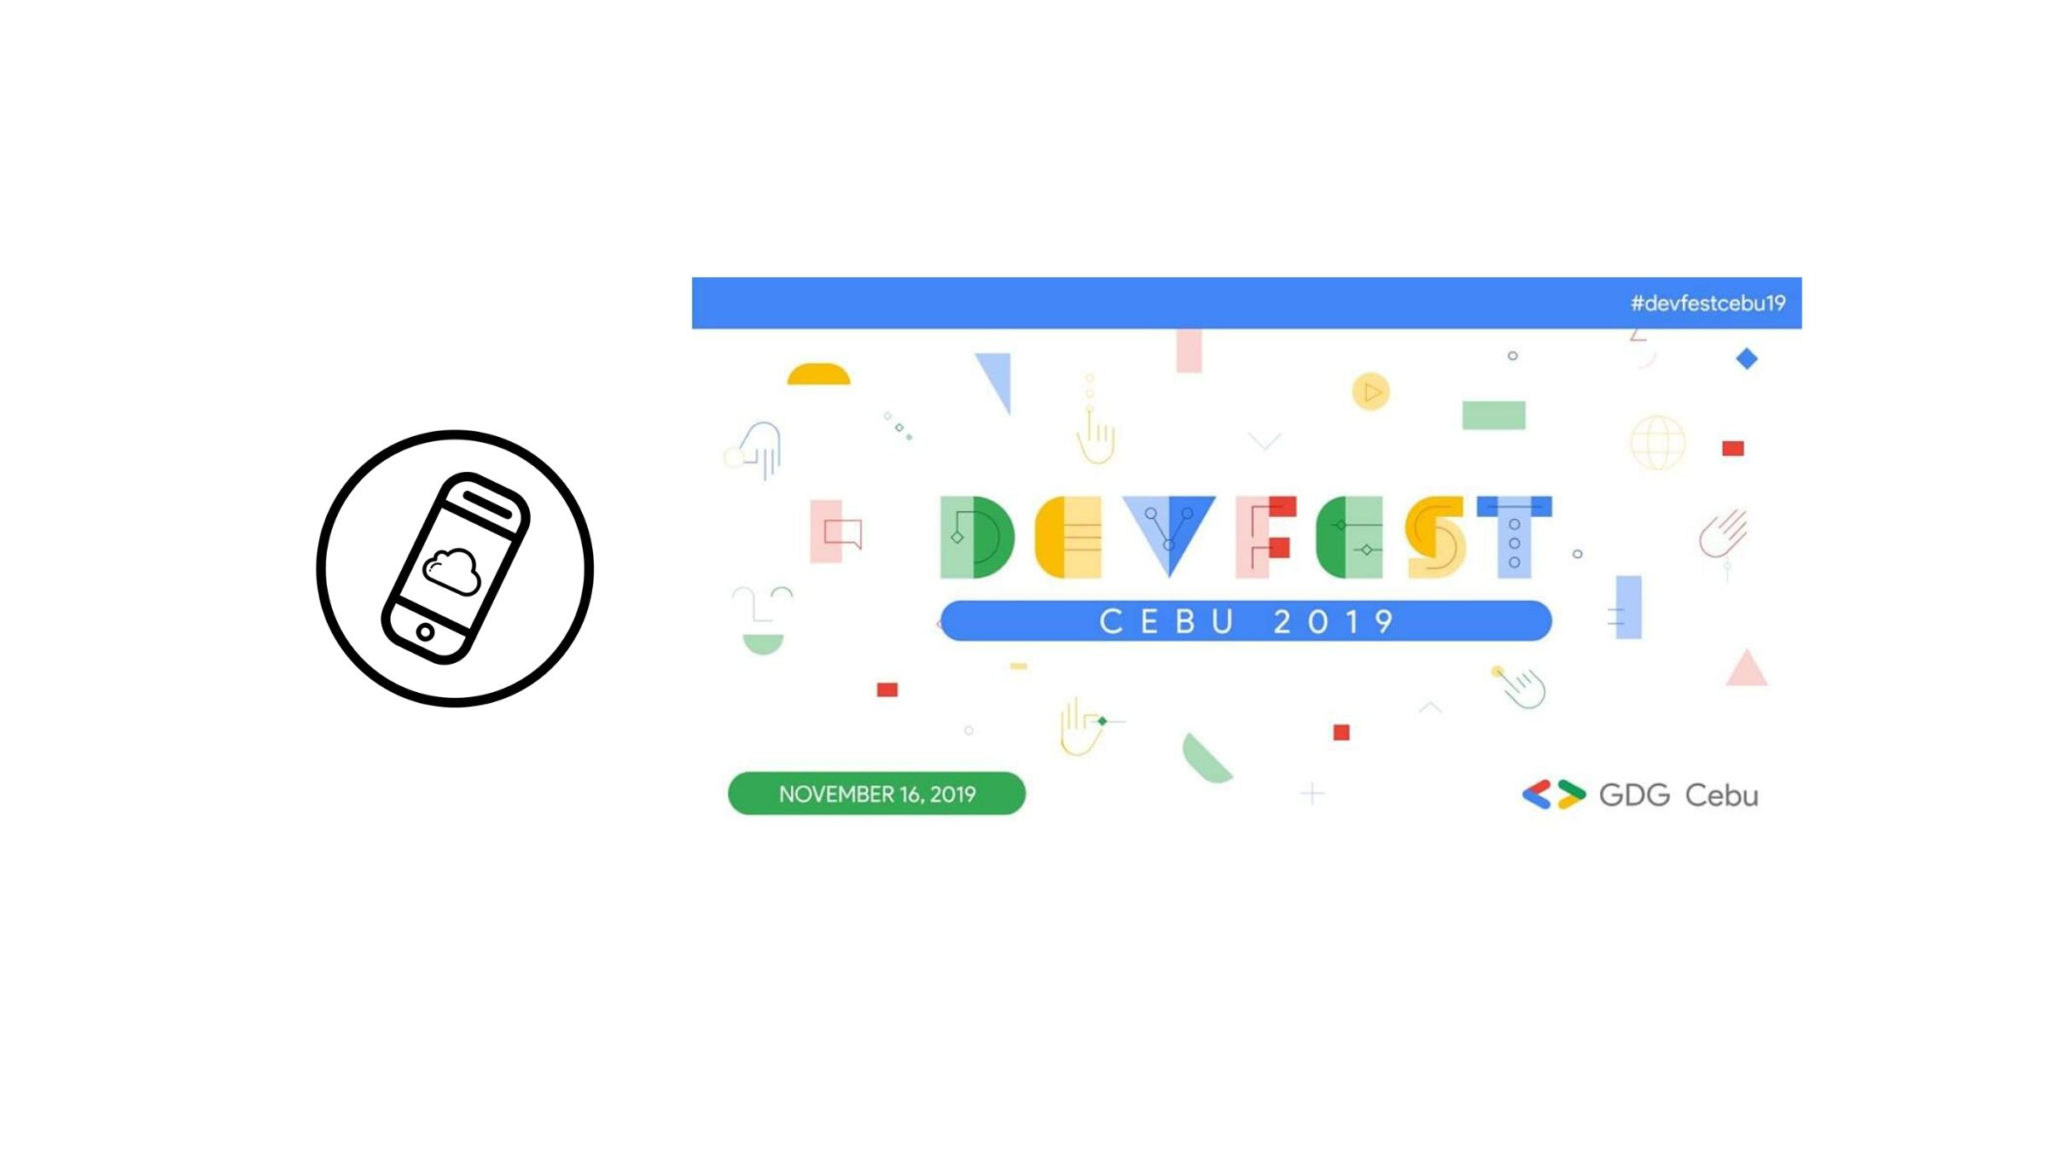 DevFest Cebu 2019 Header